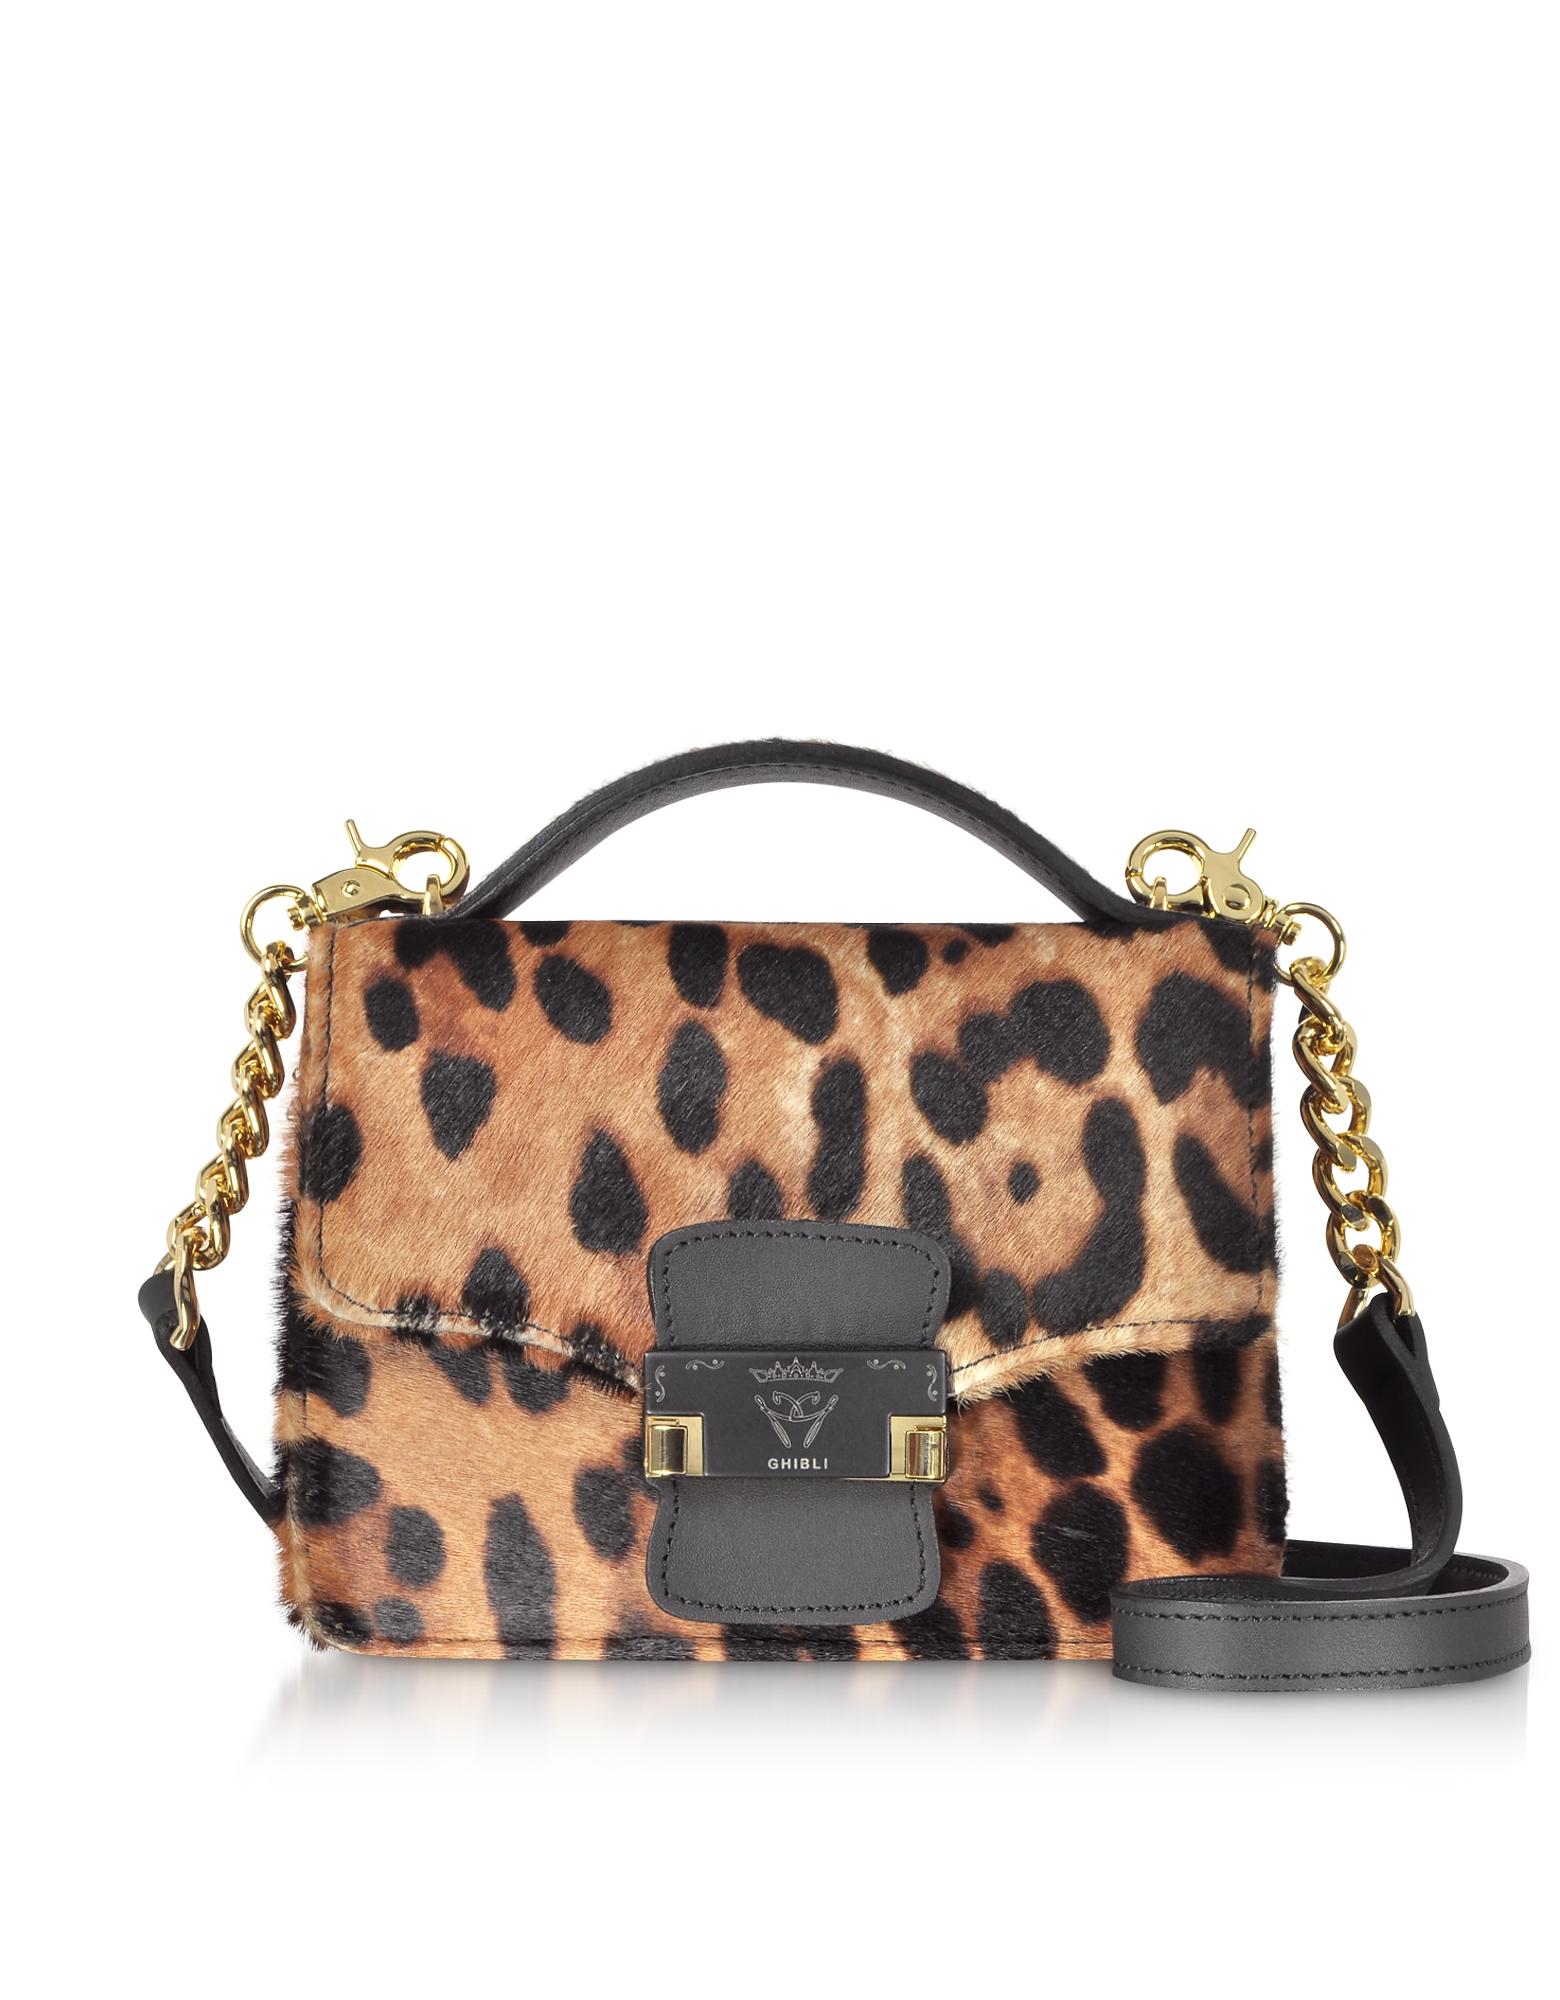 Ghibli Handbags, Leopard Printed Haircalf Leather Small Shoulder Bag